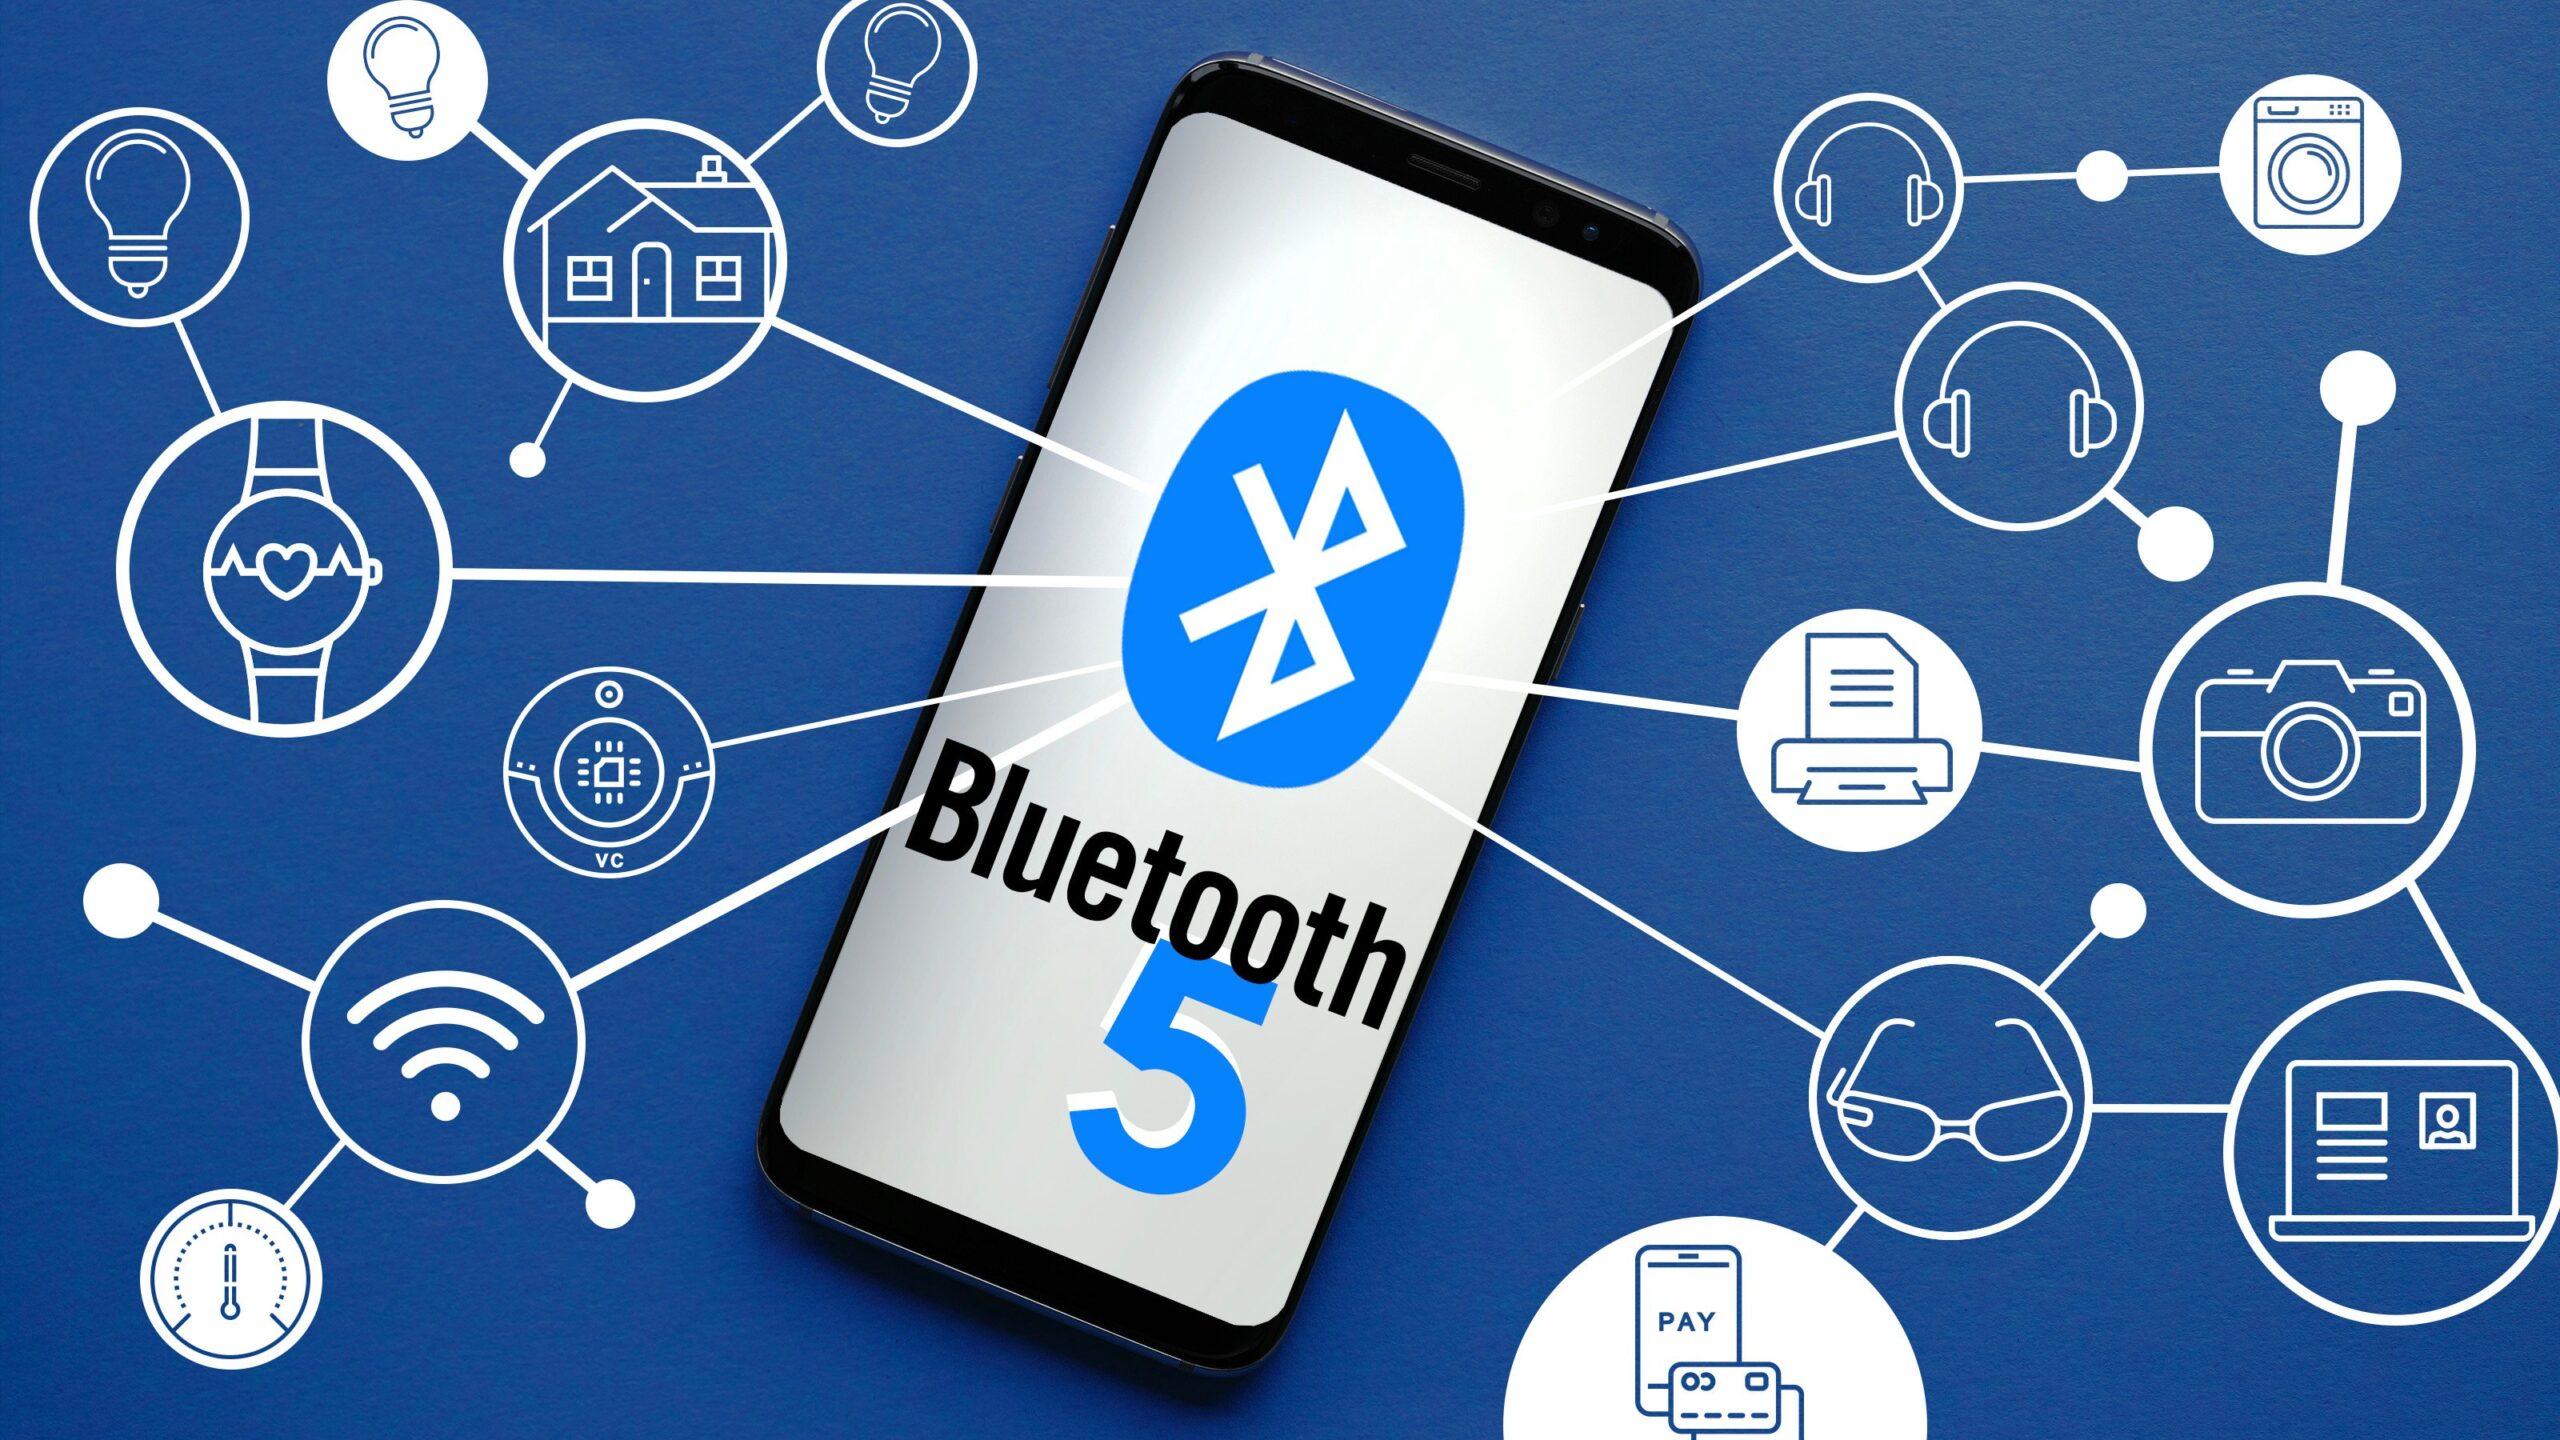 BlueTooht Sinyali ve Çalışma Prensibi